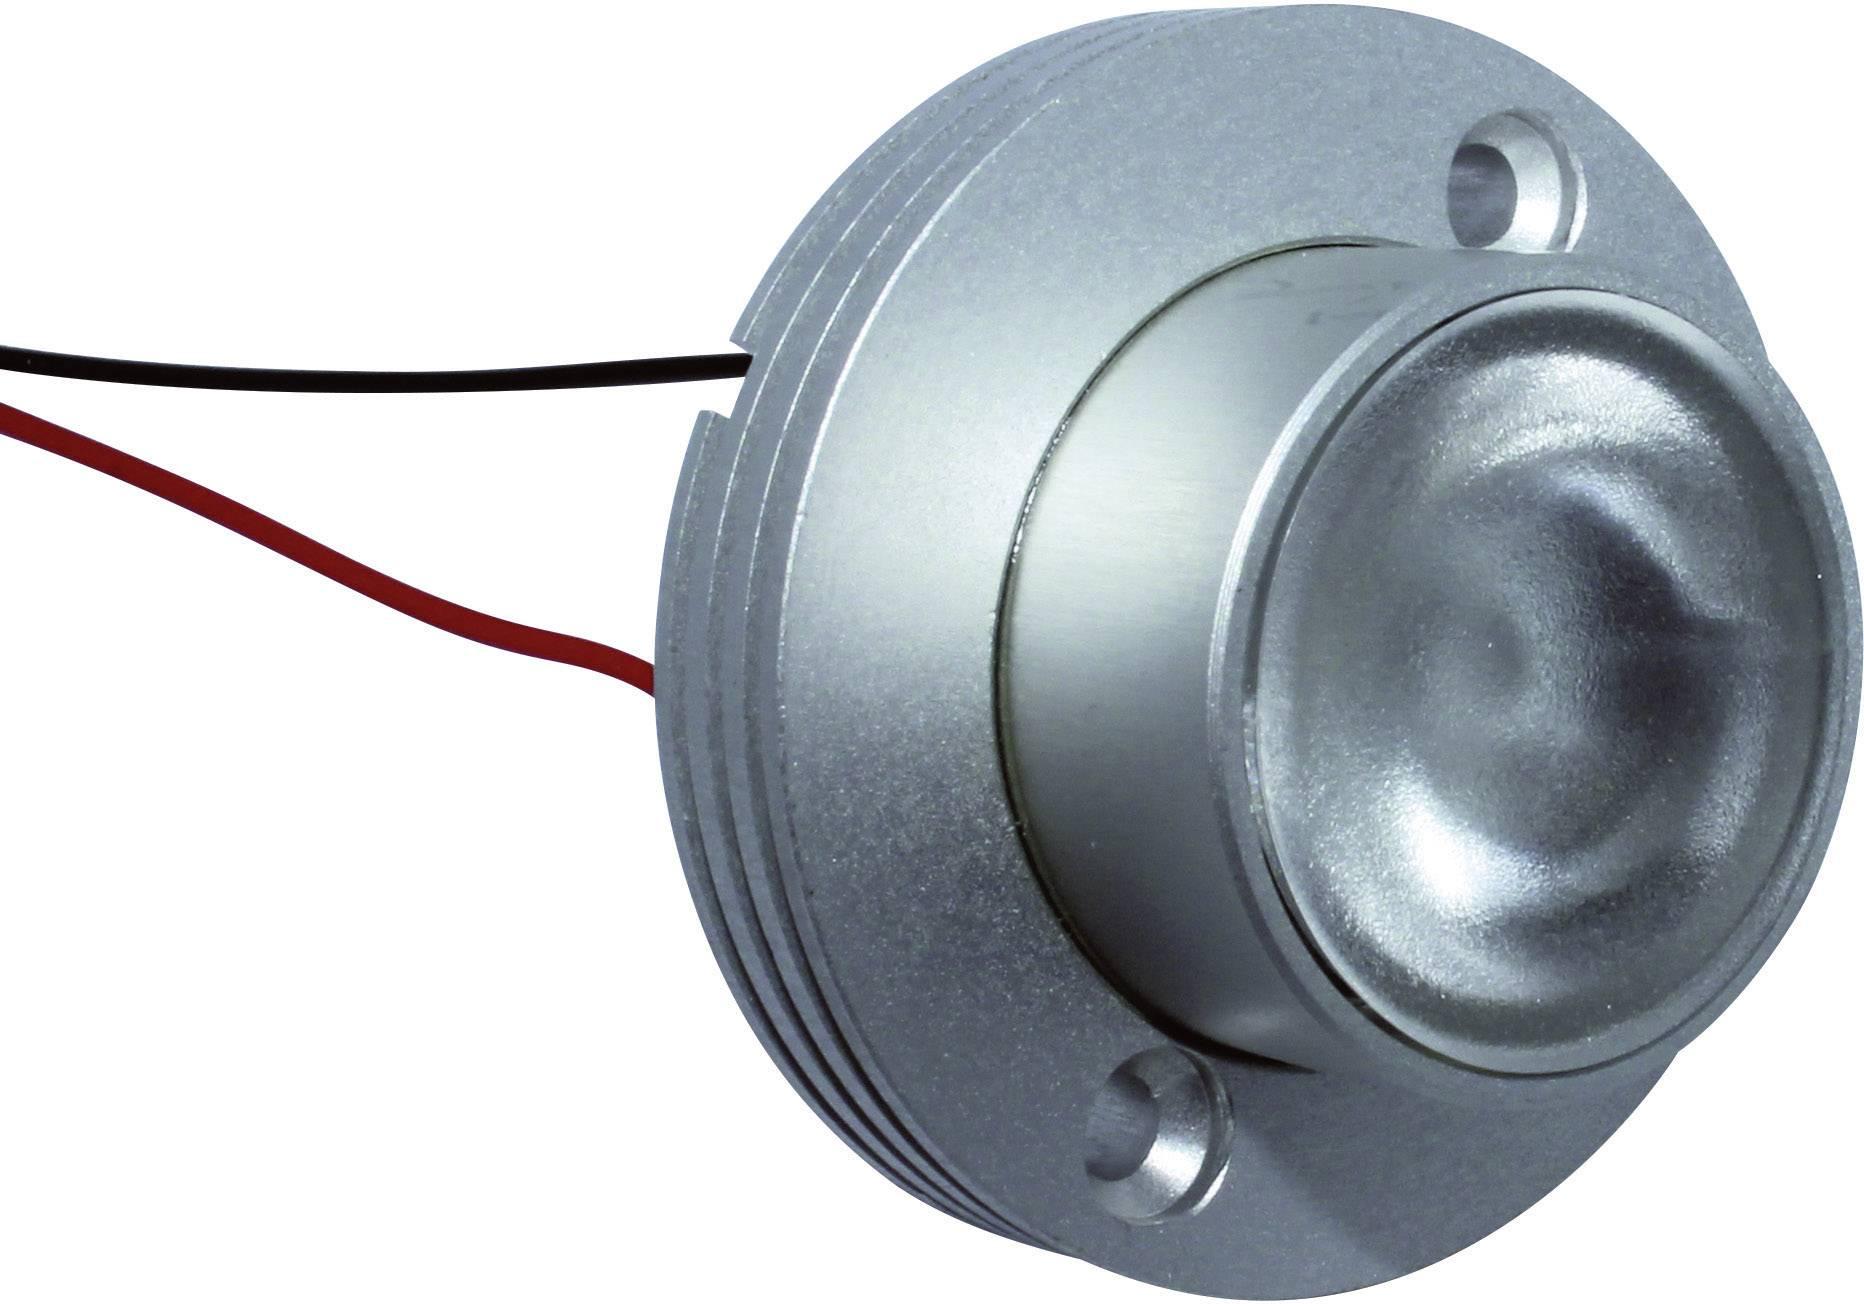 HighPower LED-spot Signal Construct QAUR1301L030, 30 °, 70 lm, 1 W, 2.3 V, červená